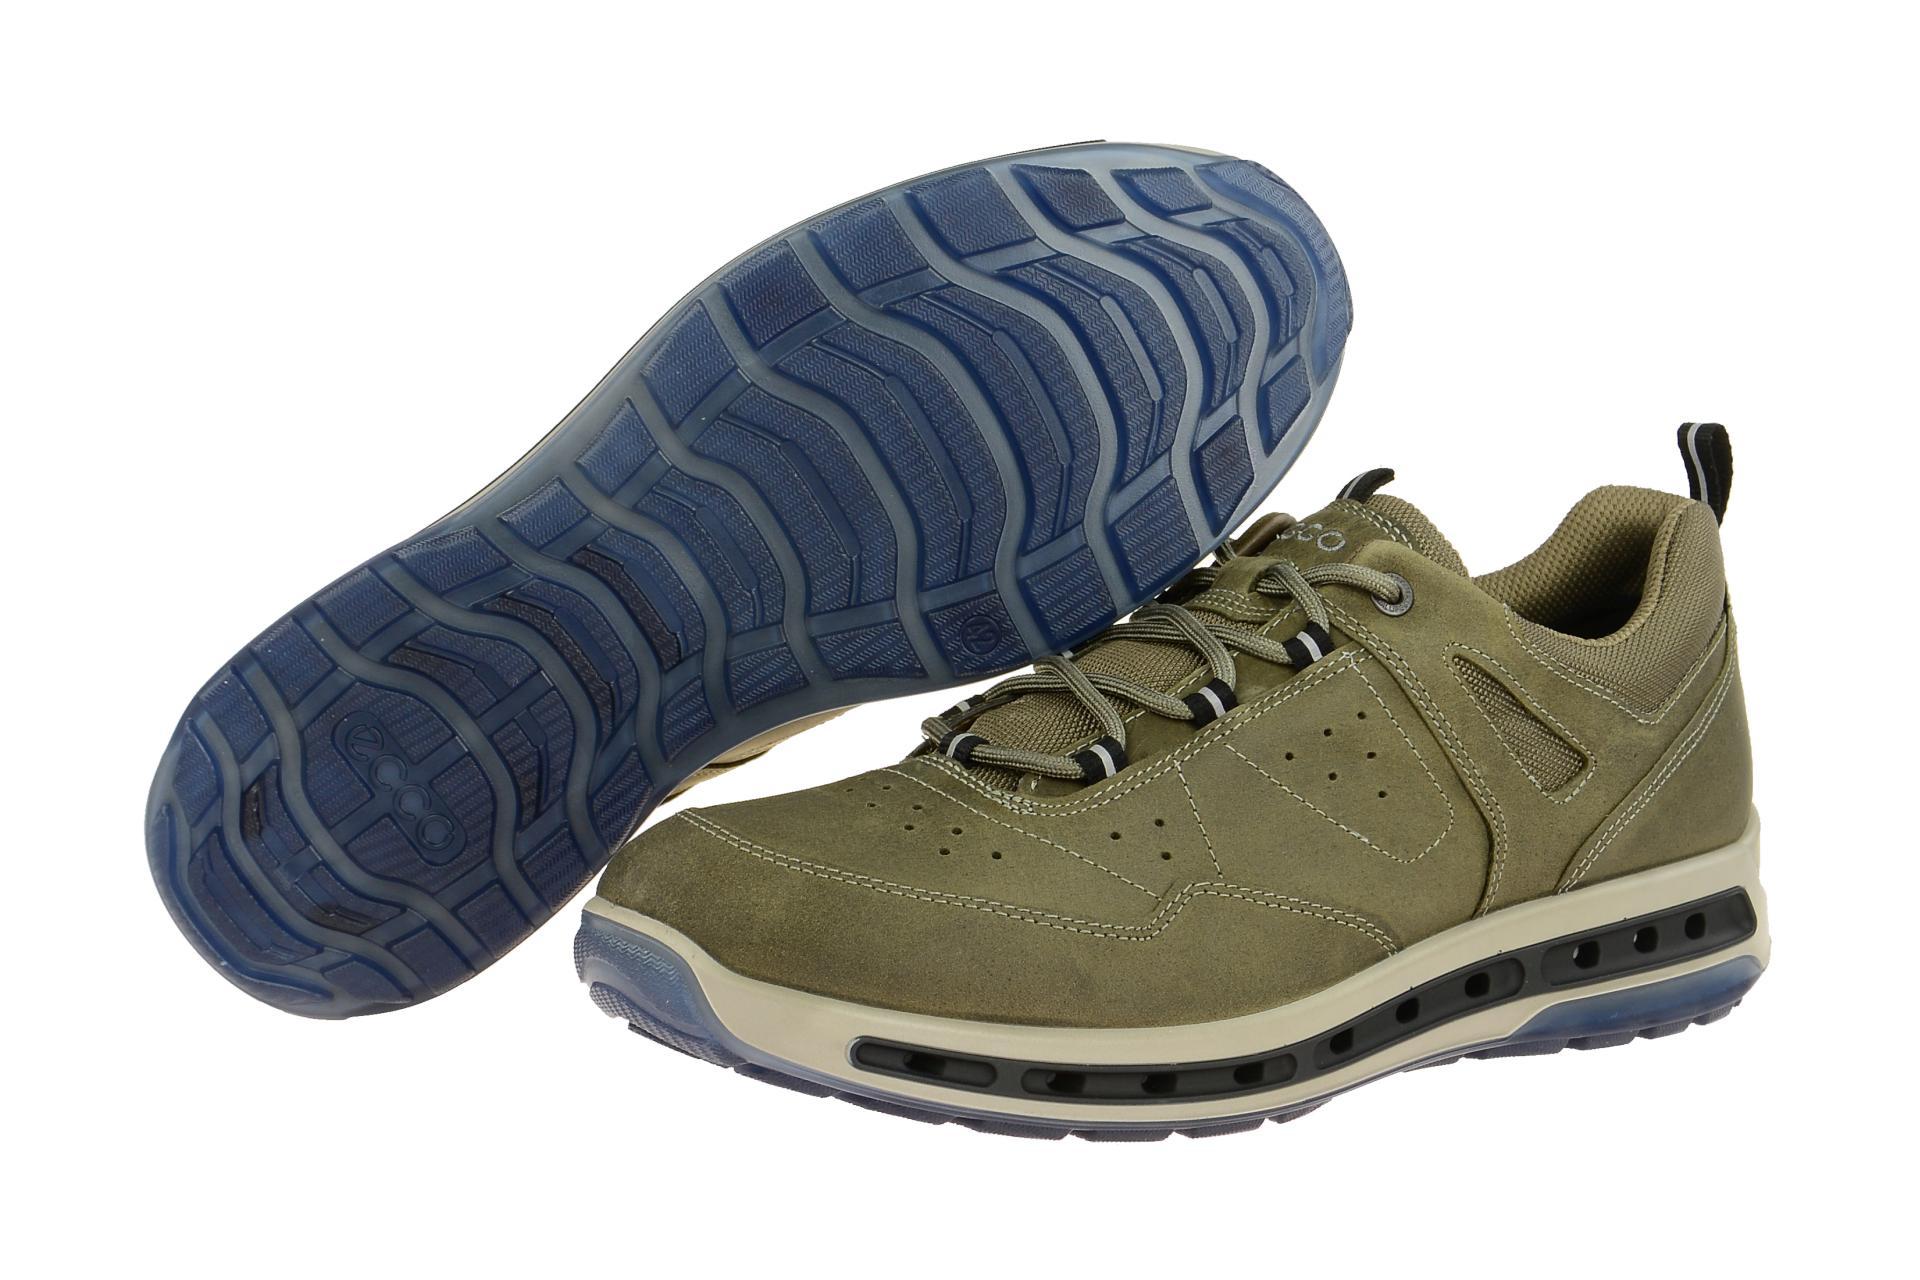 b25c89a3148df2 Ecco Schuhe COOL WALK grau Herrenschuhe sportliche Halbschuhe ...